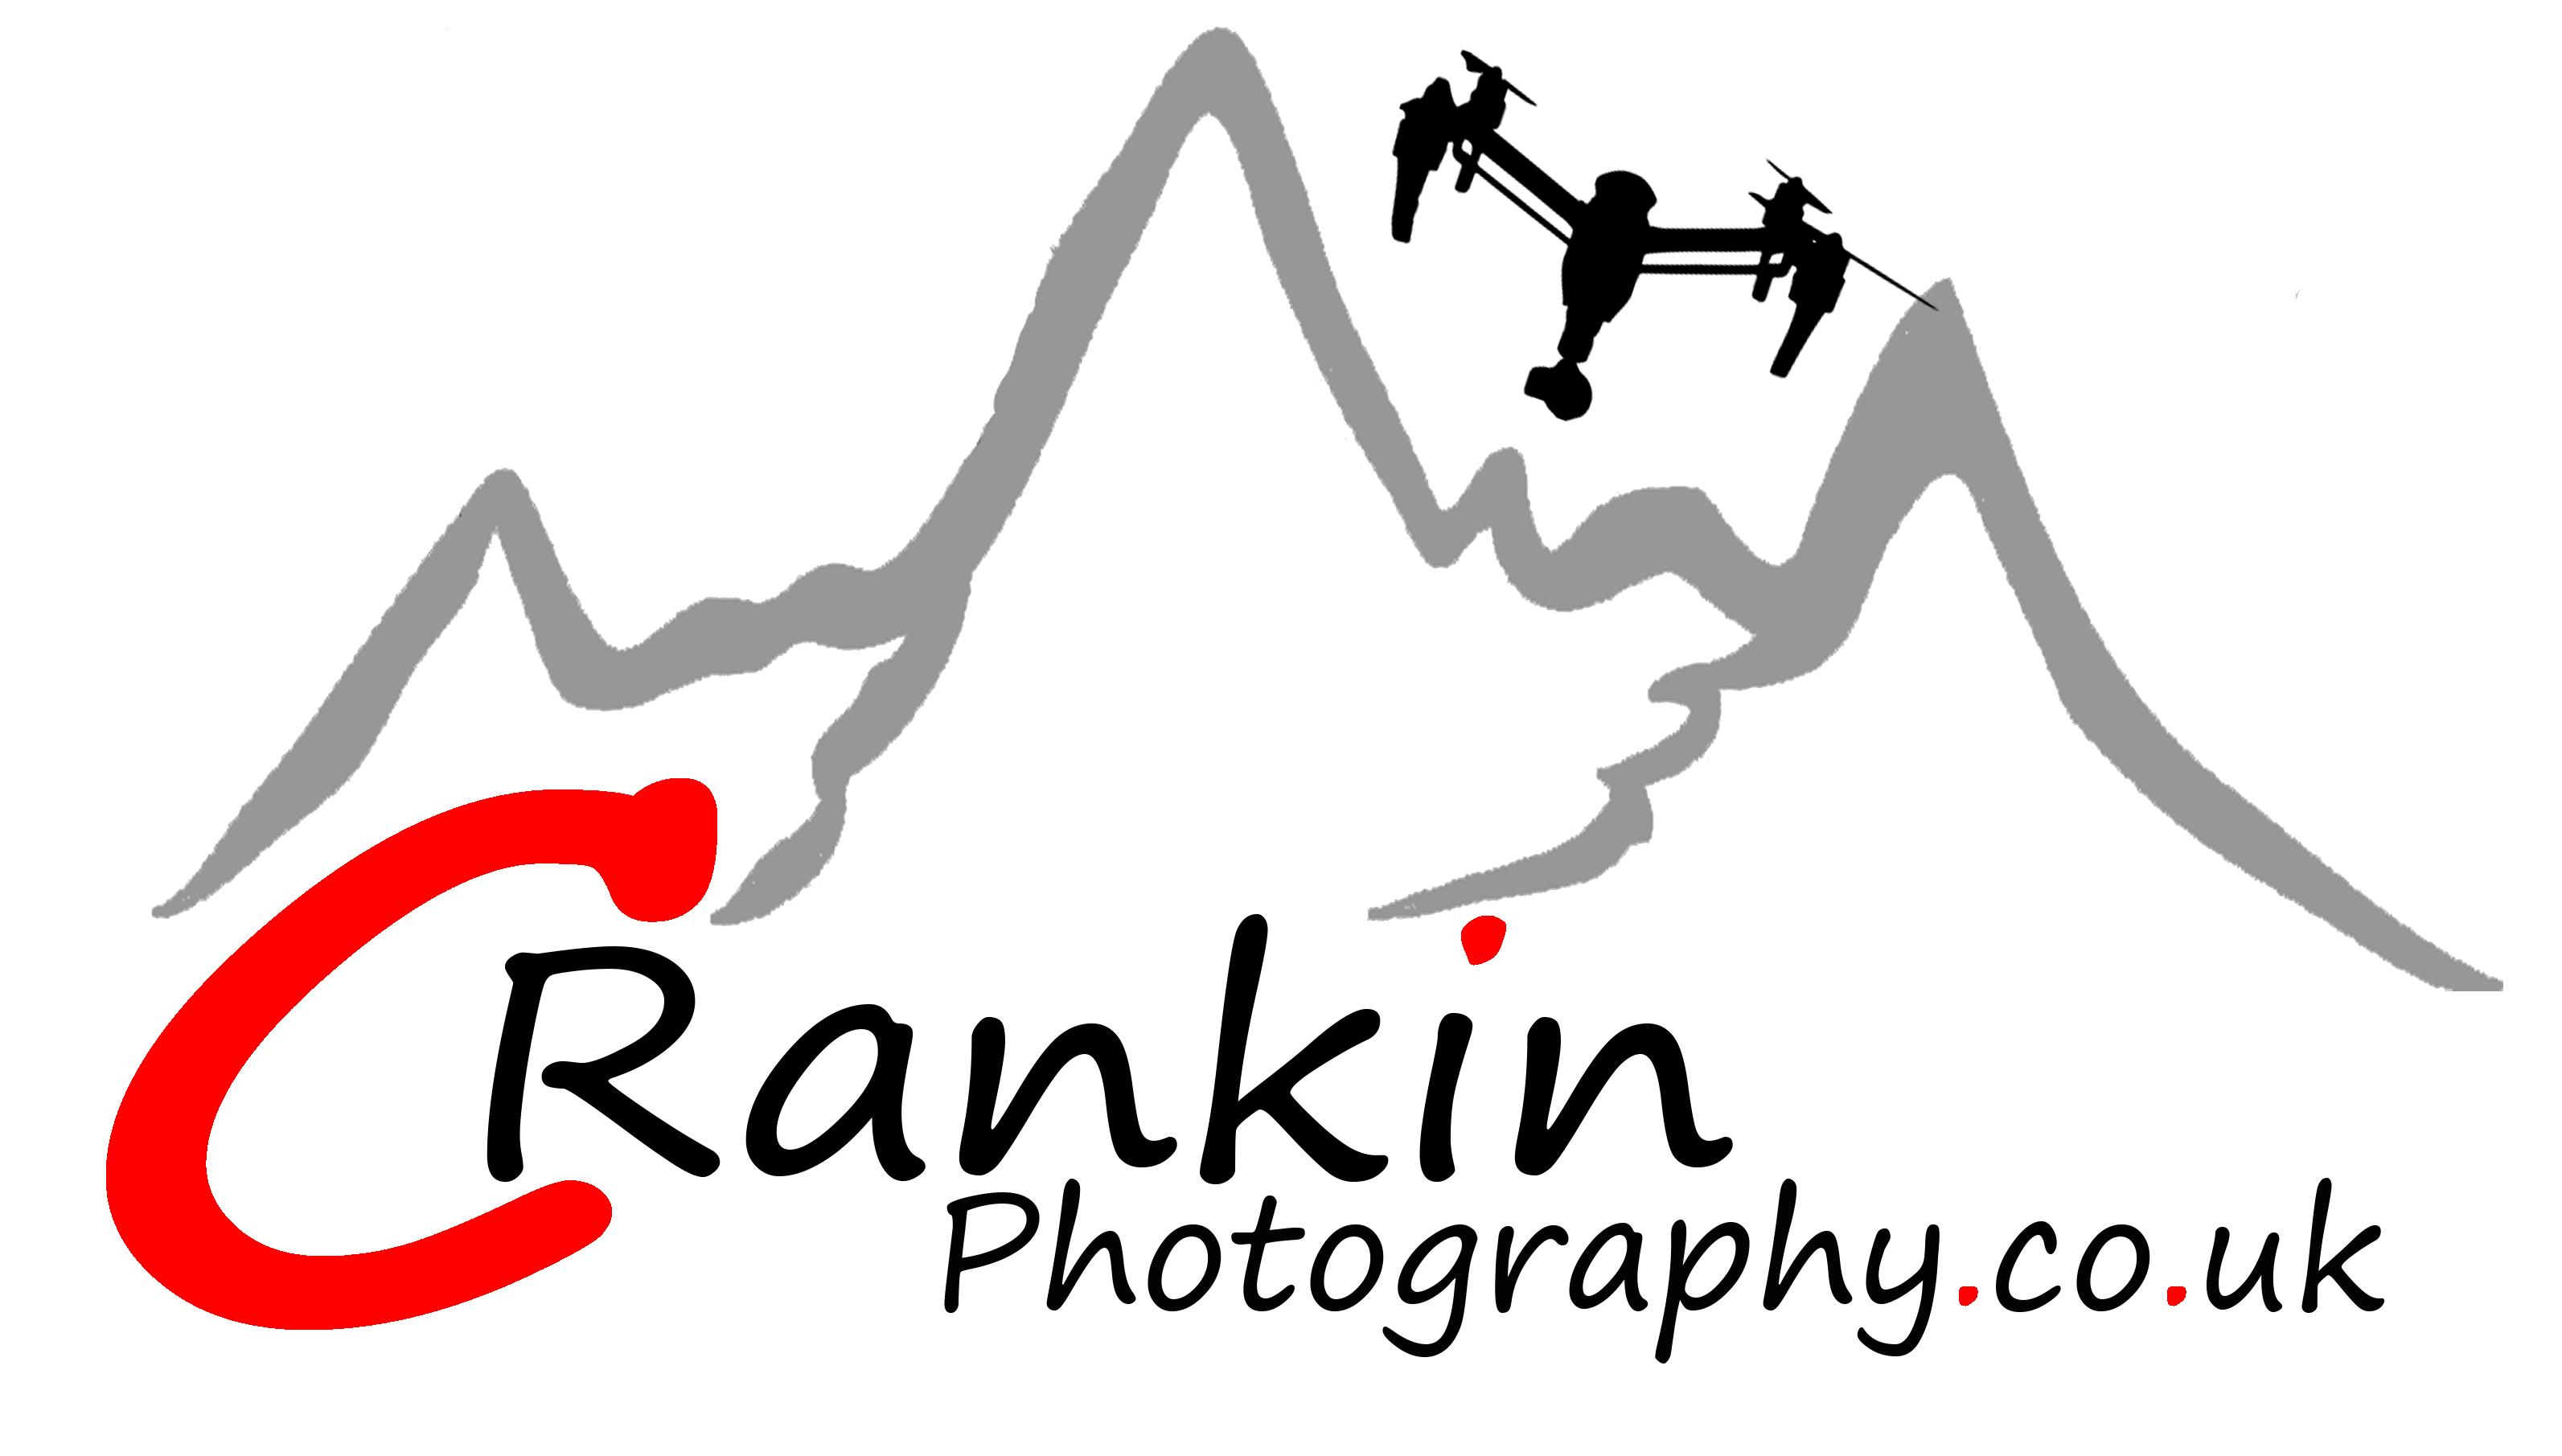 C Rankin Photography